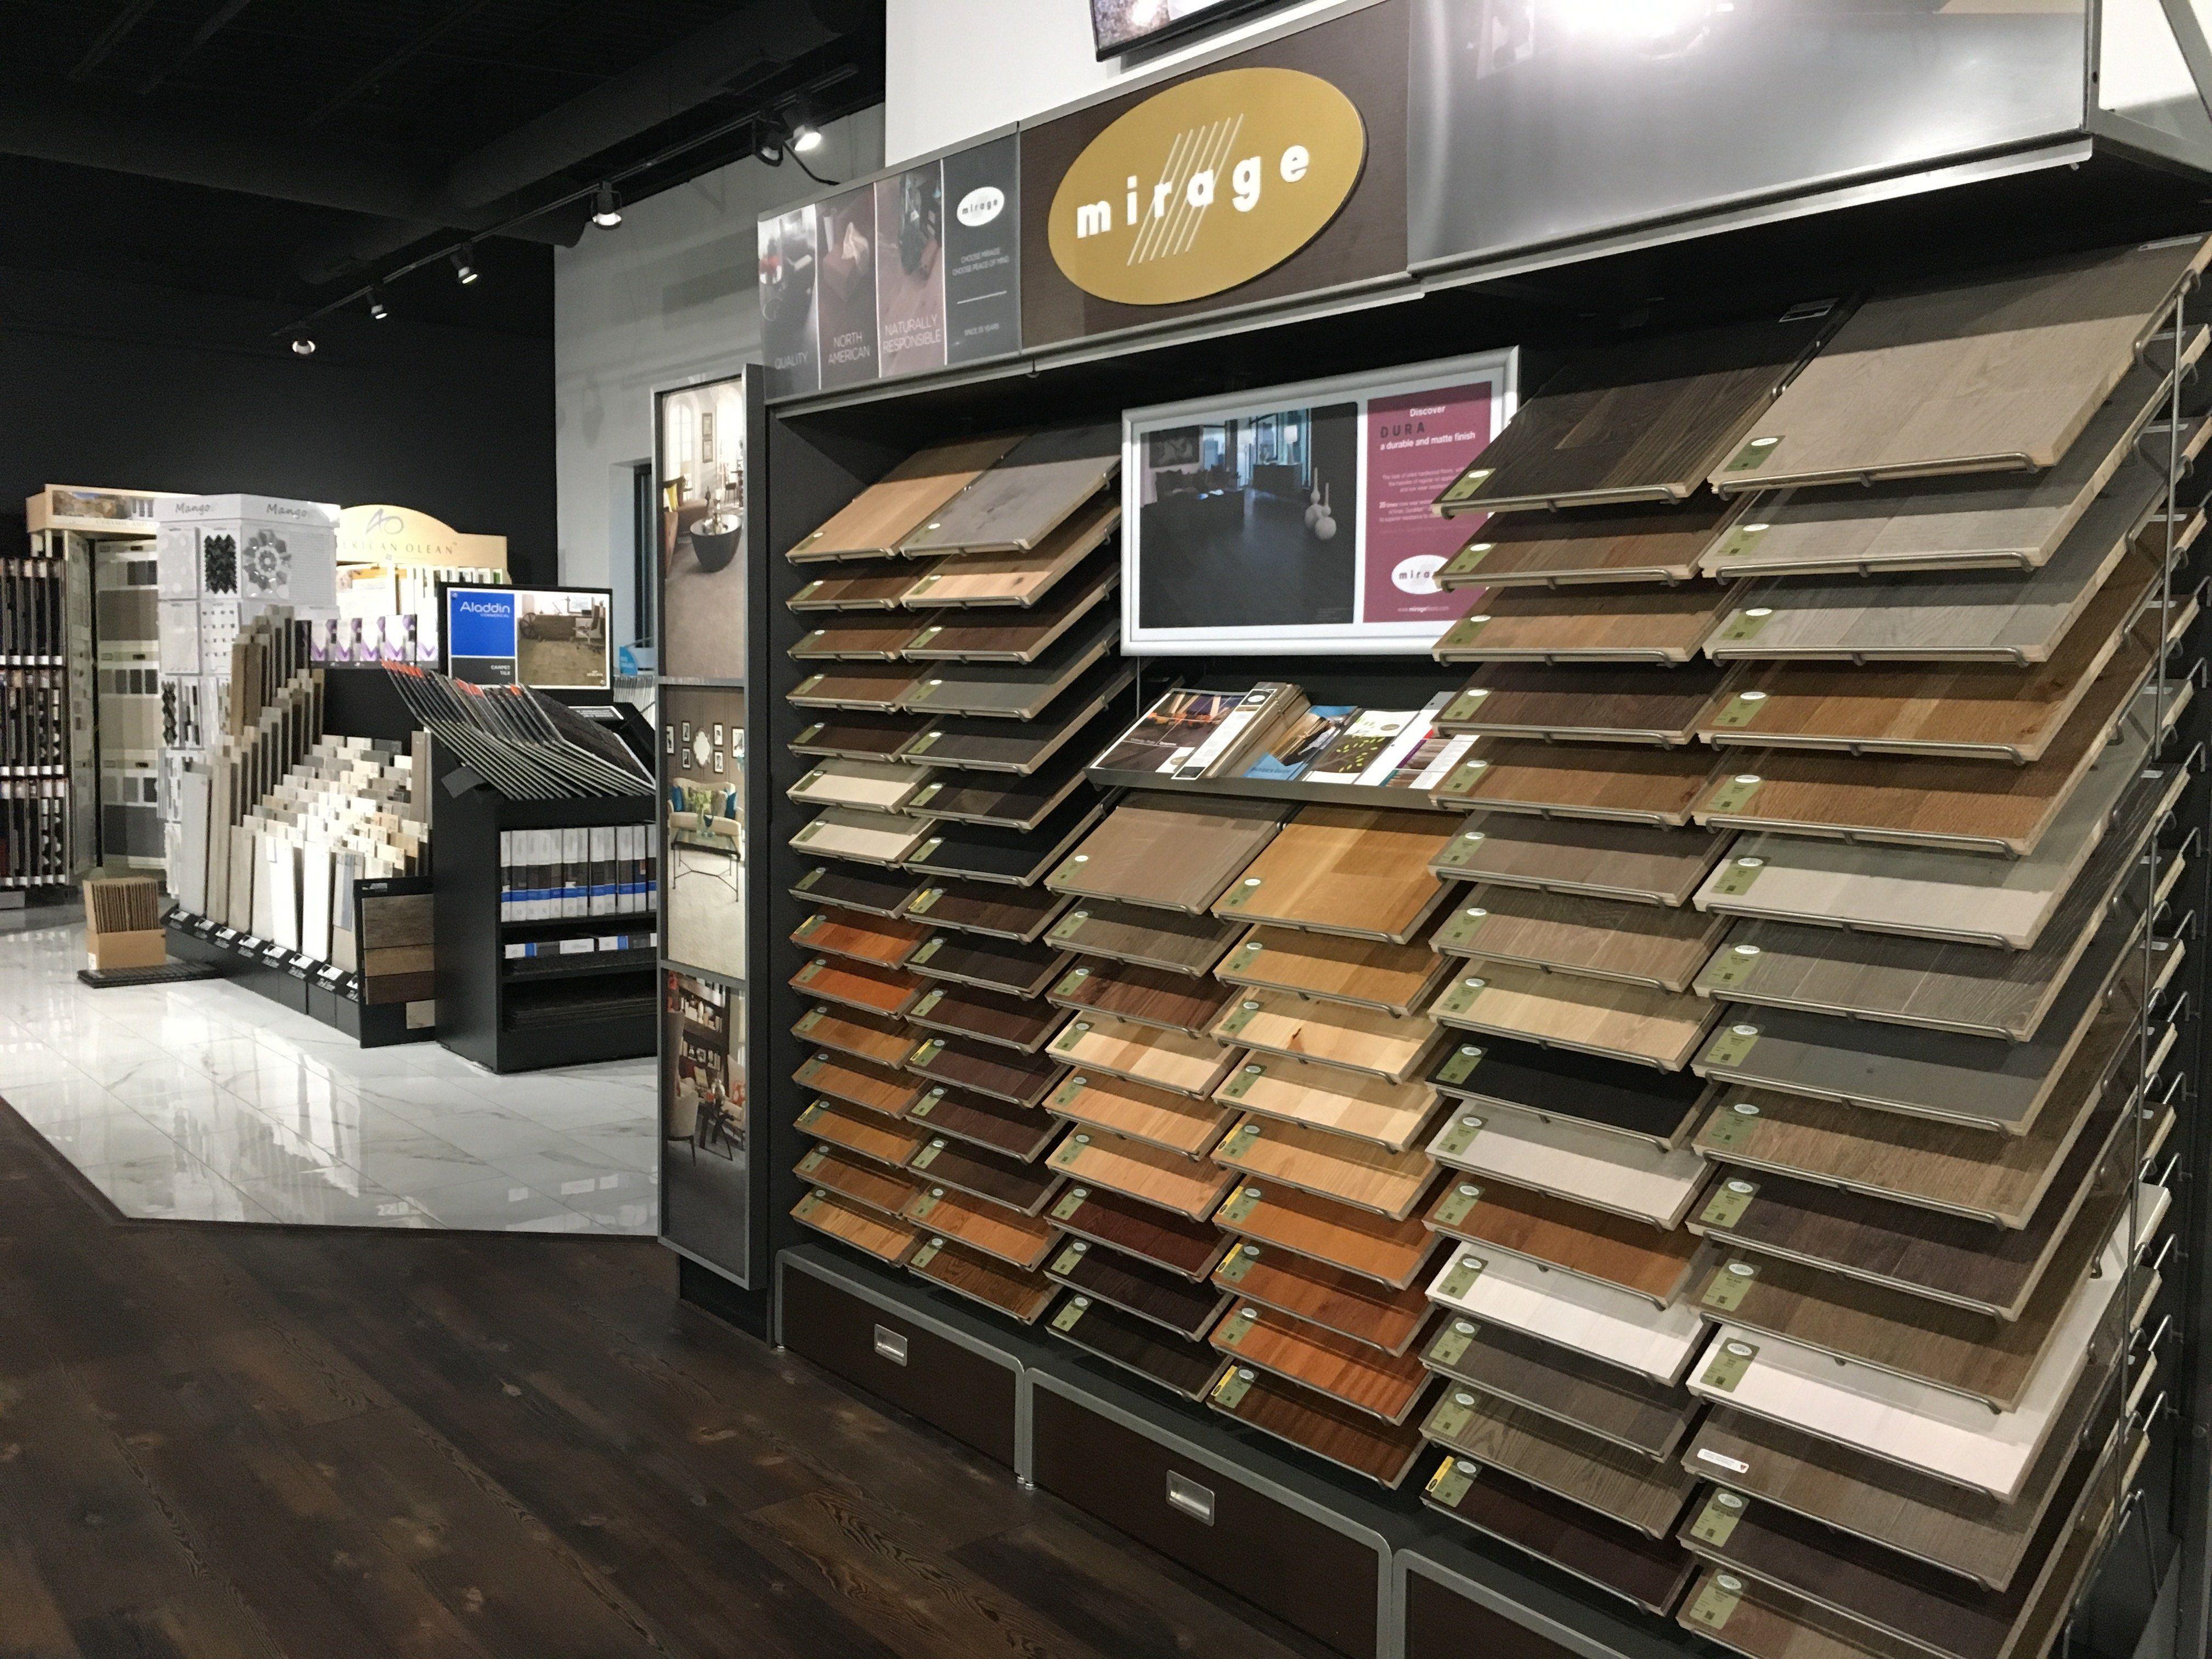 Creative Carpet Flooring Mokena Illinois Mirage Floors The World S Finest And Best Hardwood Floors Flooring Sale Hardwood Floors Carpet Flooring